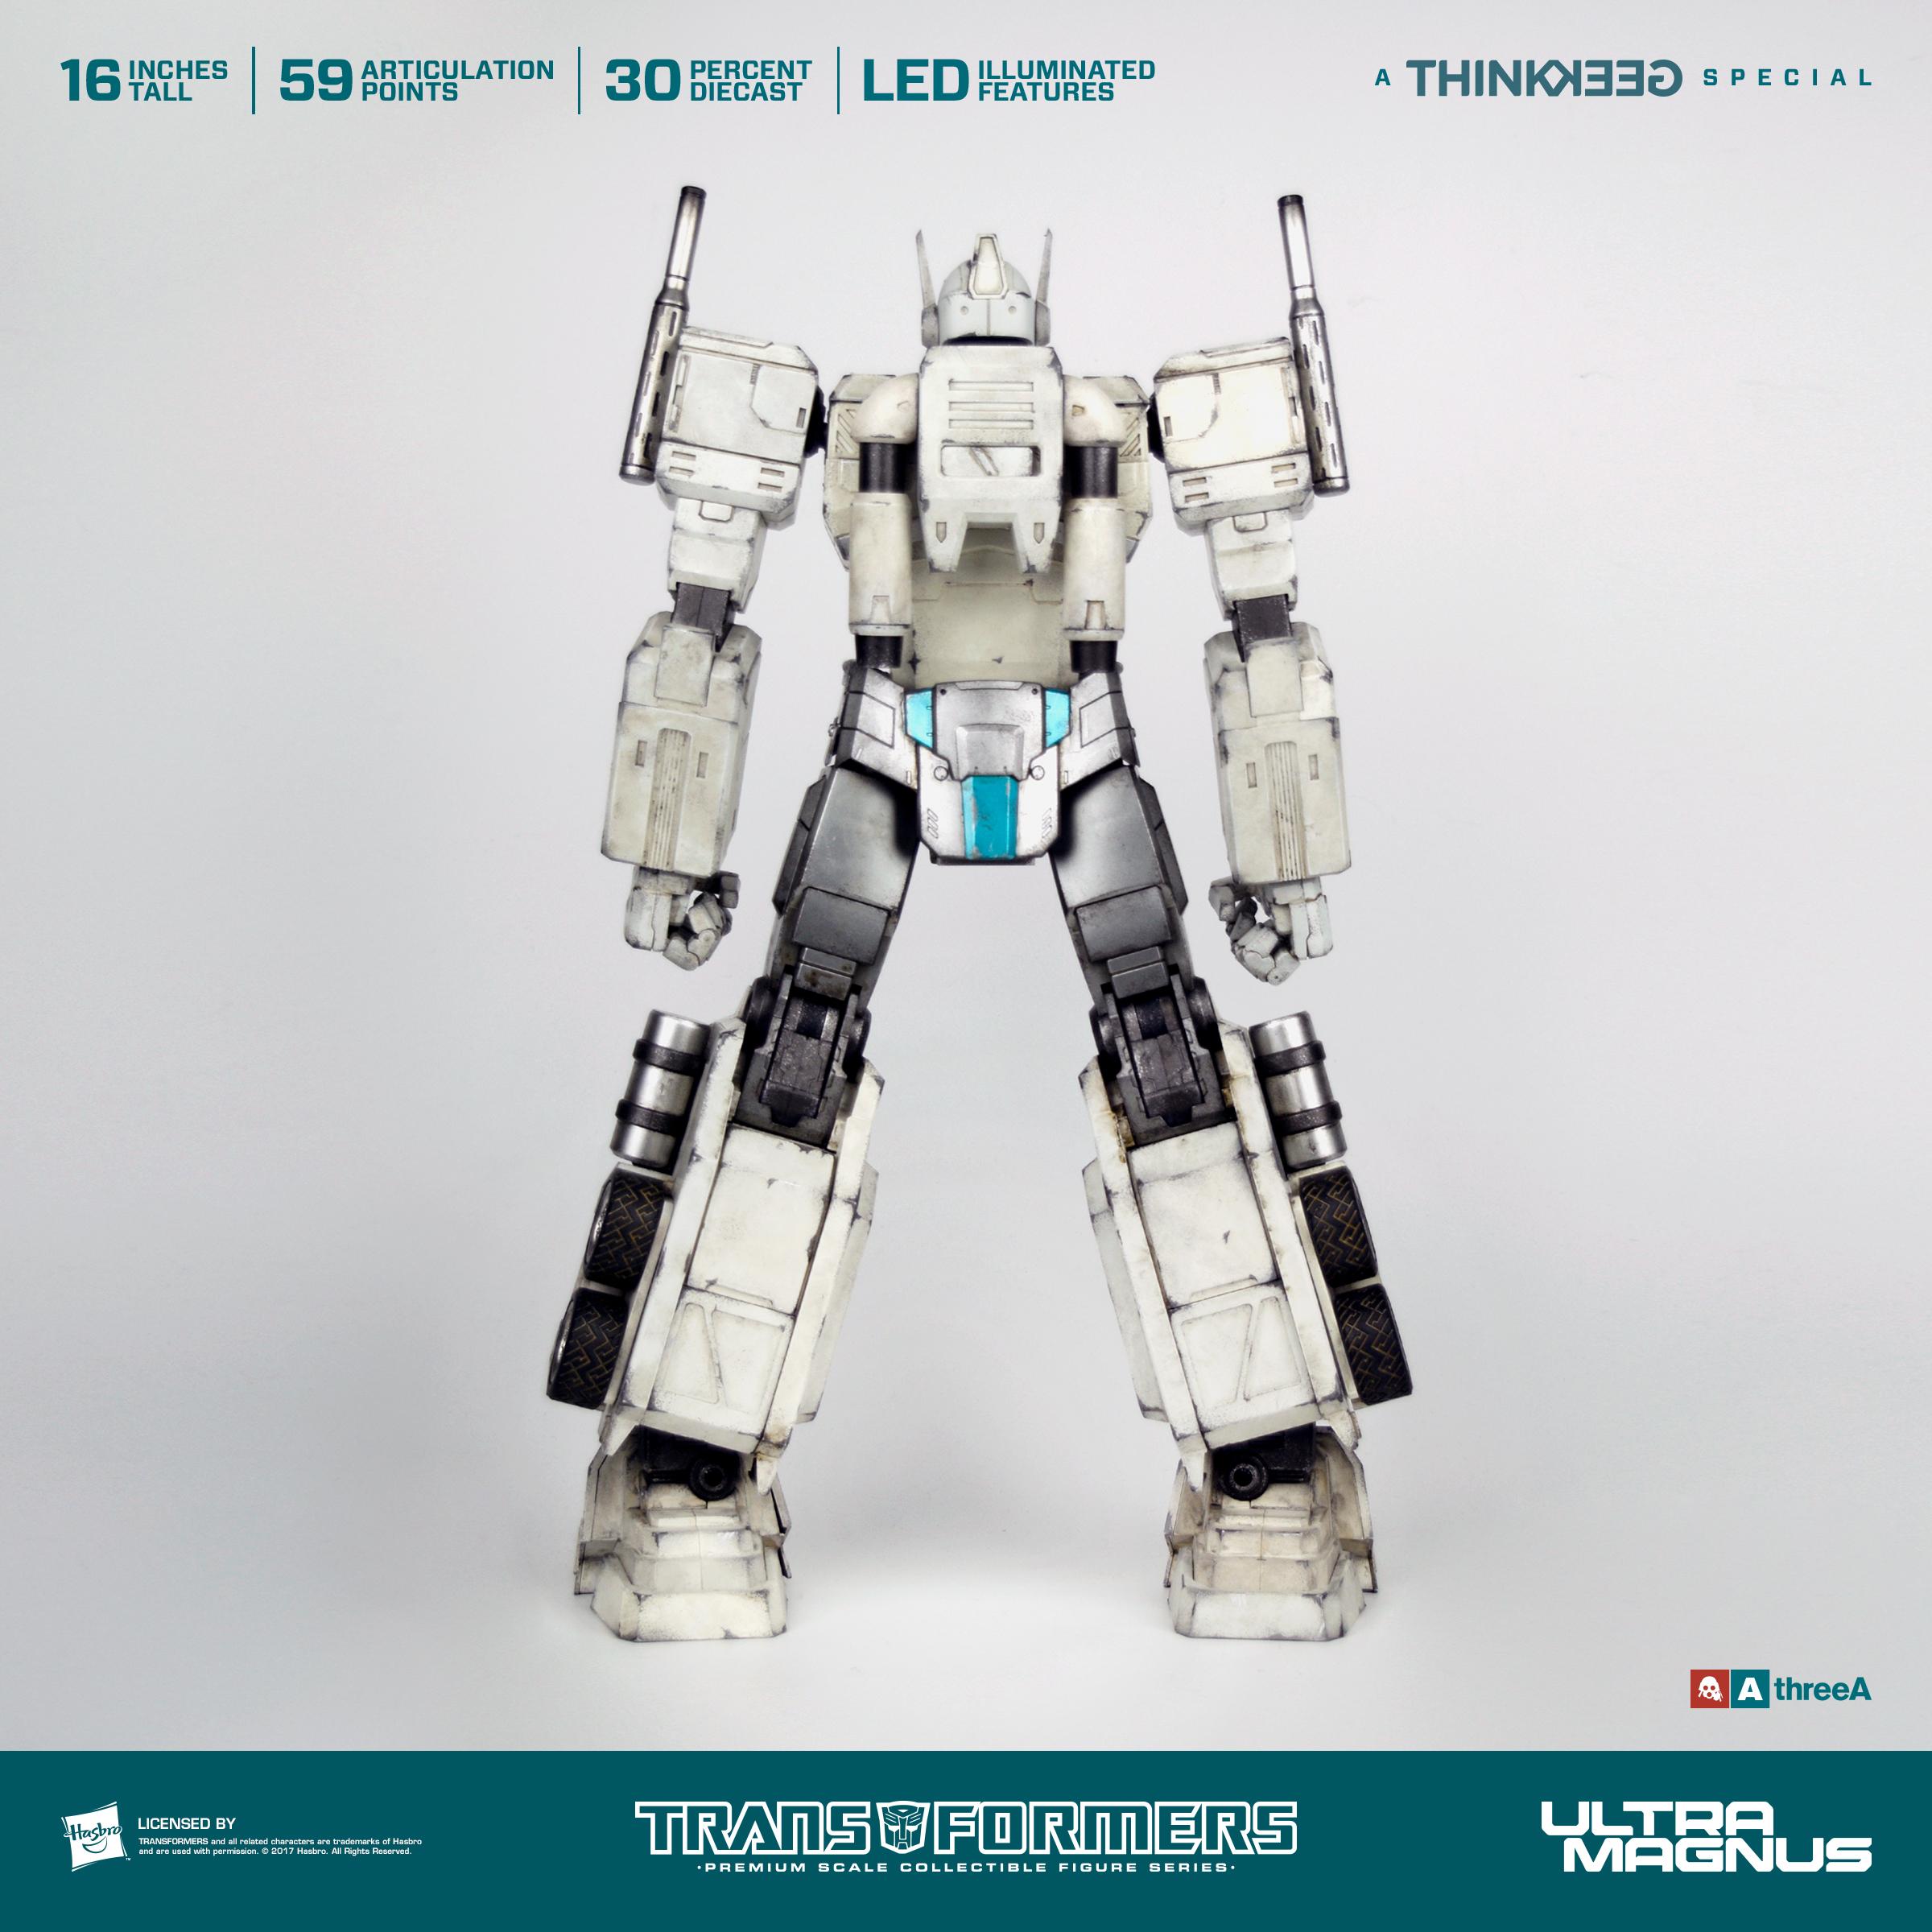 3A_Transformers_G1_UltraMagnus_RetailImages_2400x2400_002.jpg